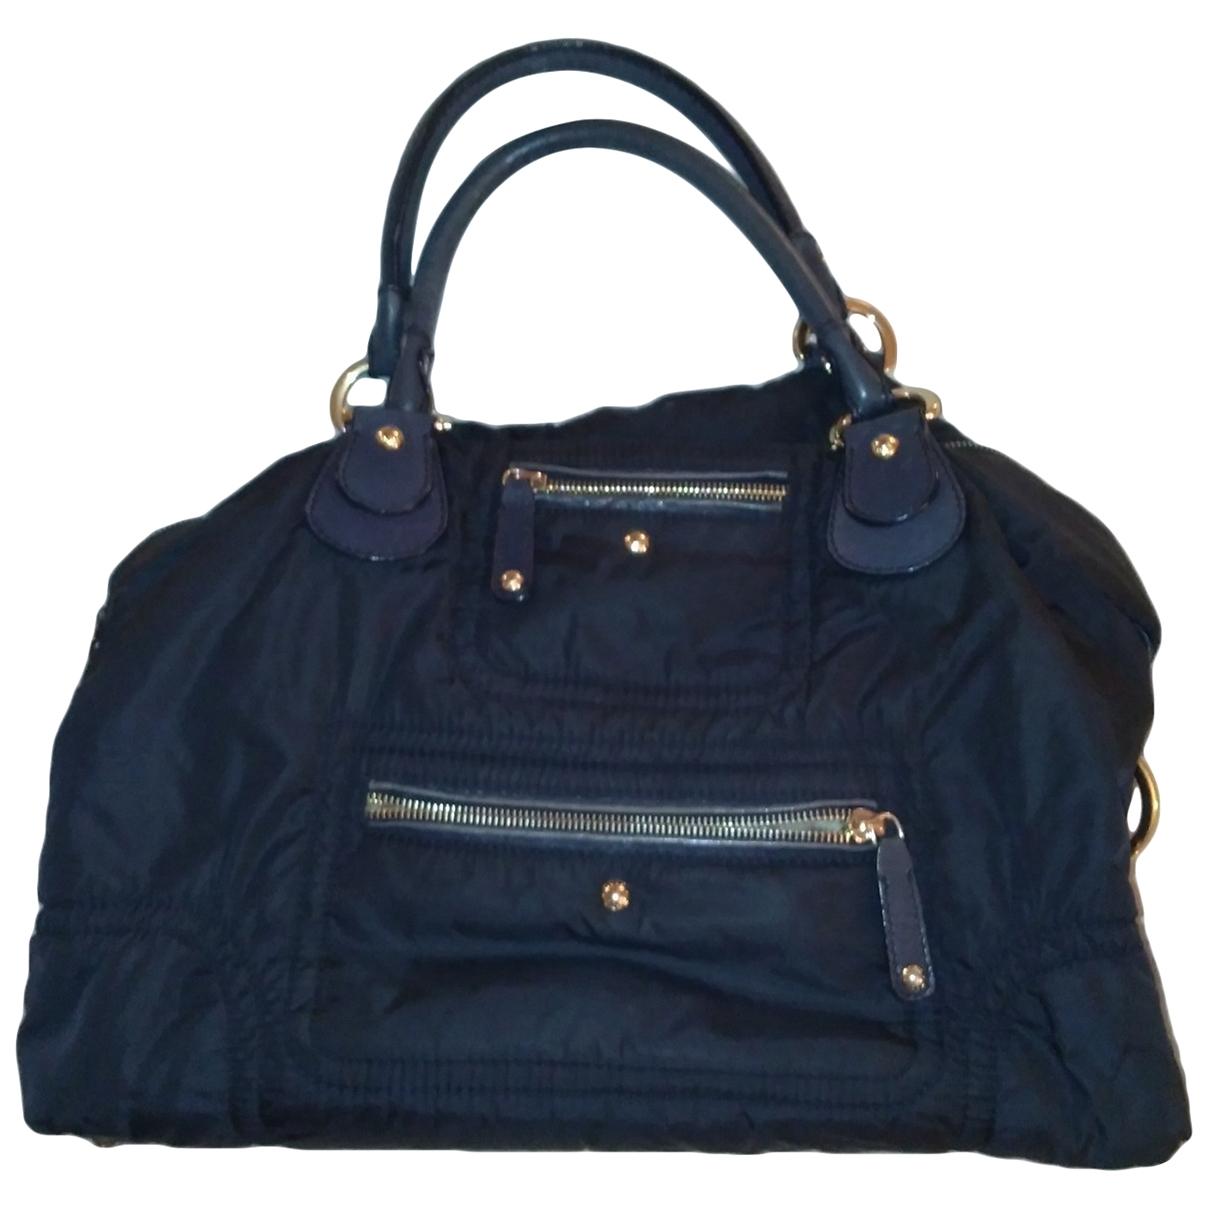 Tods \N Handtasche in  Blau Leinen